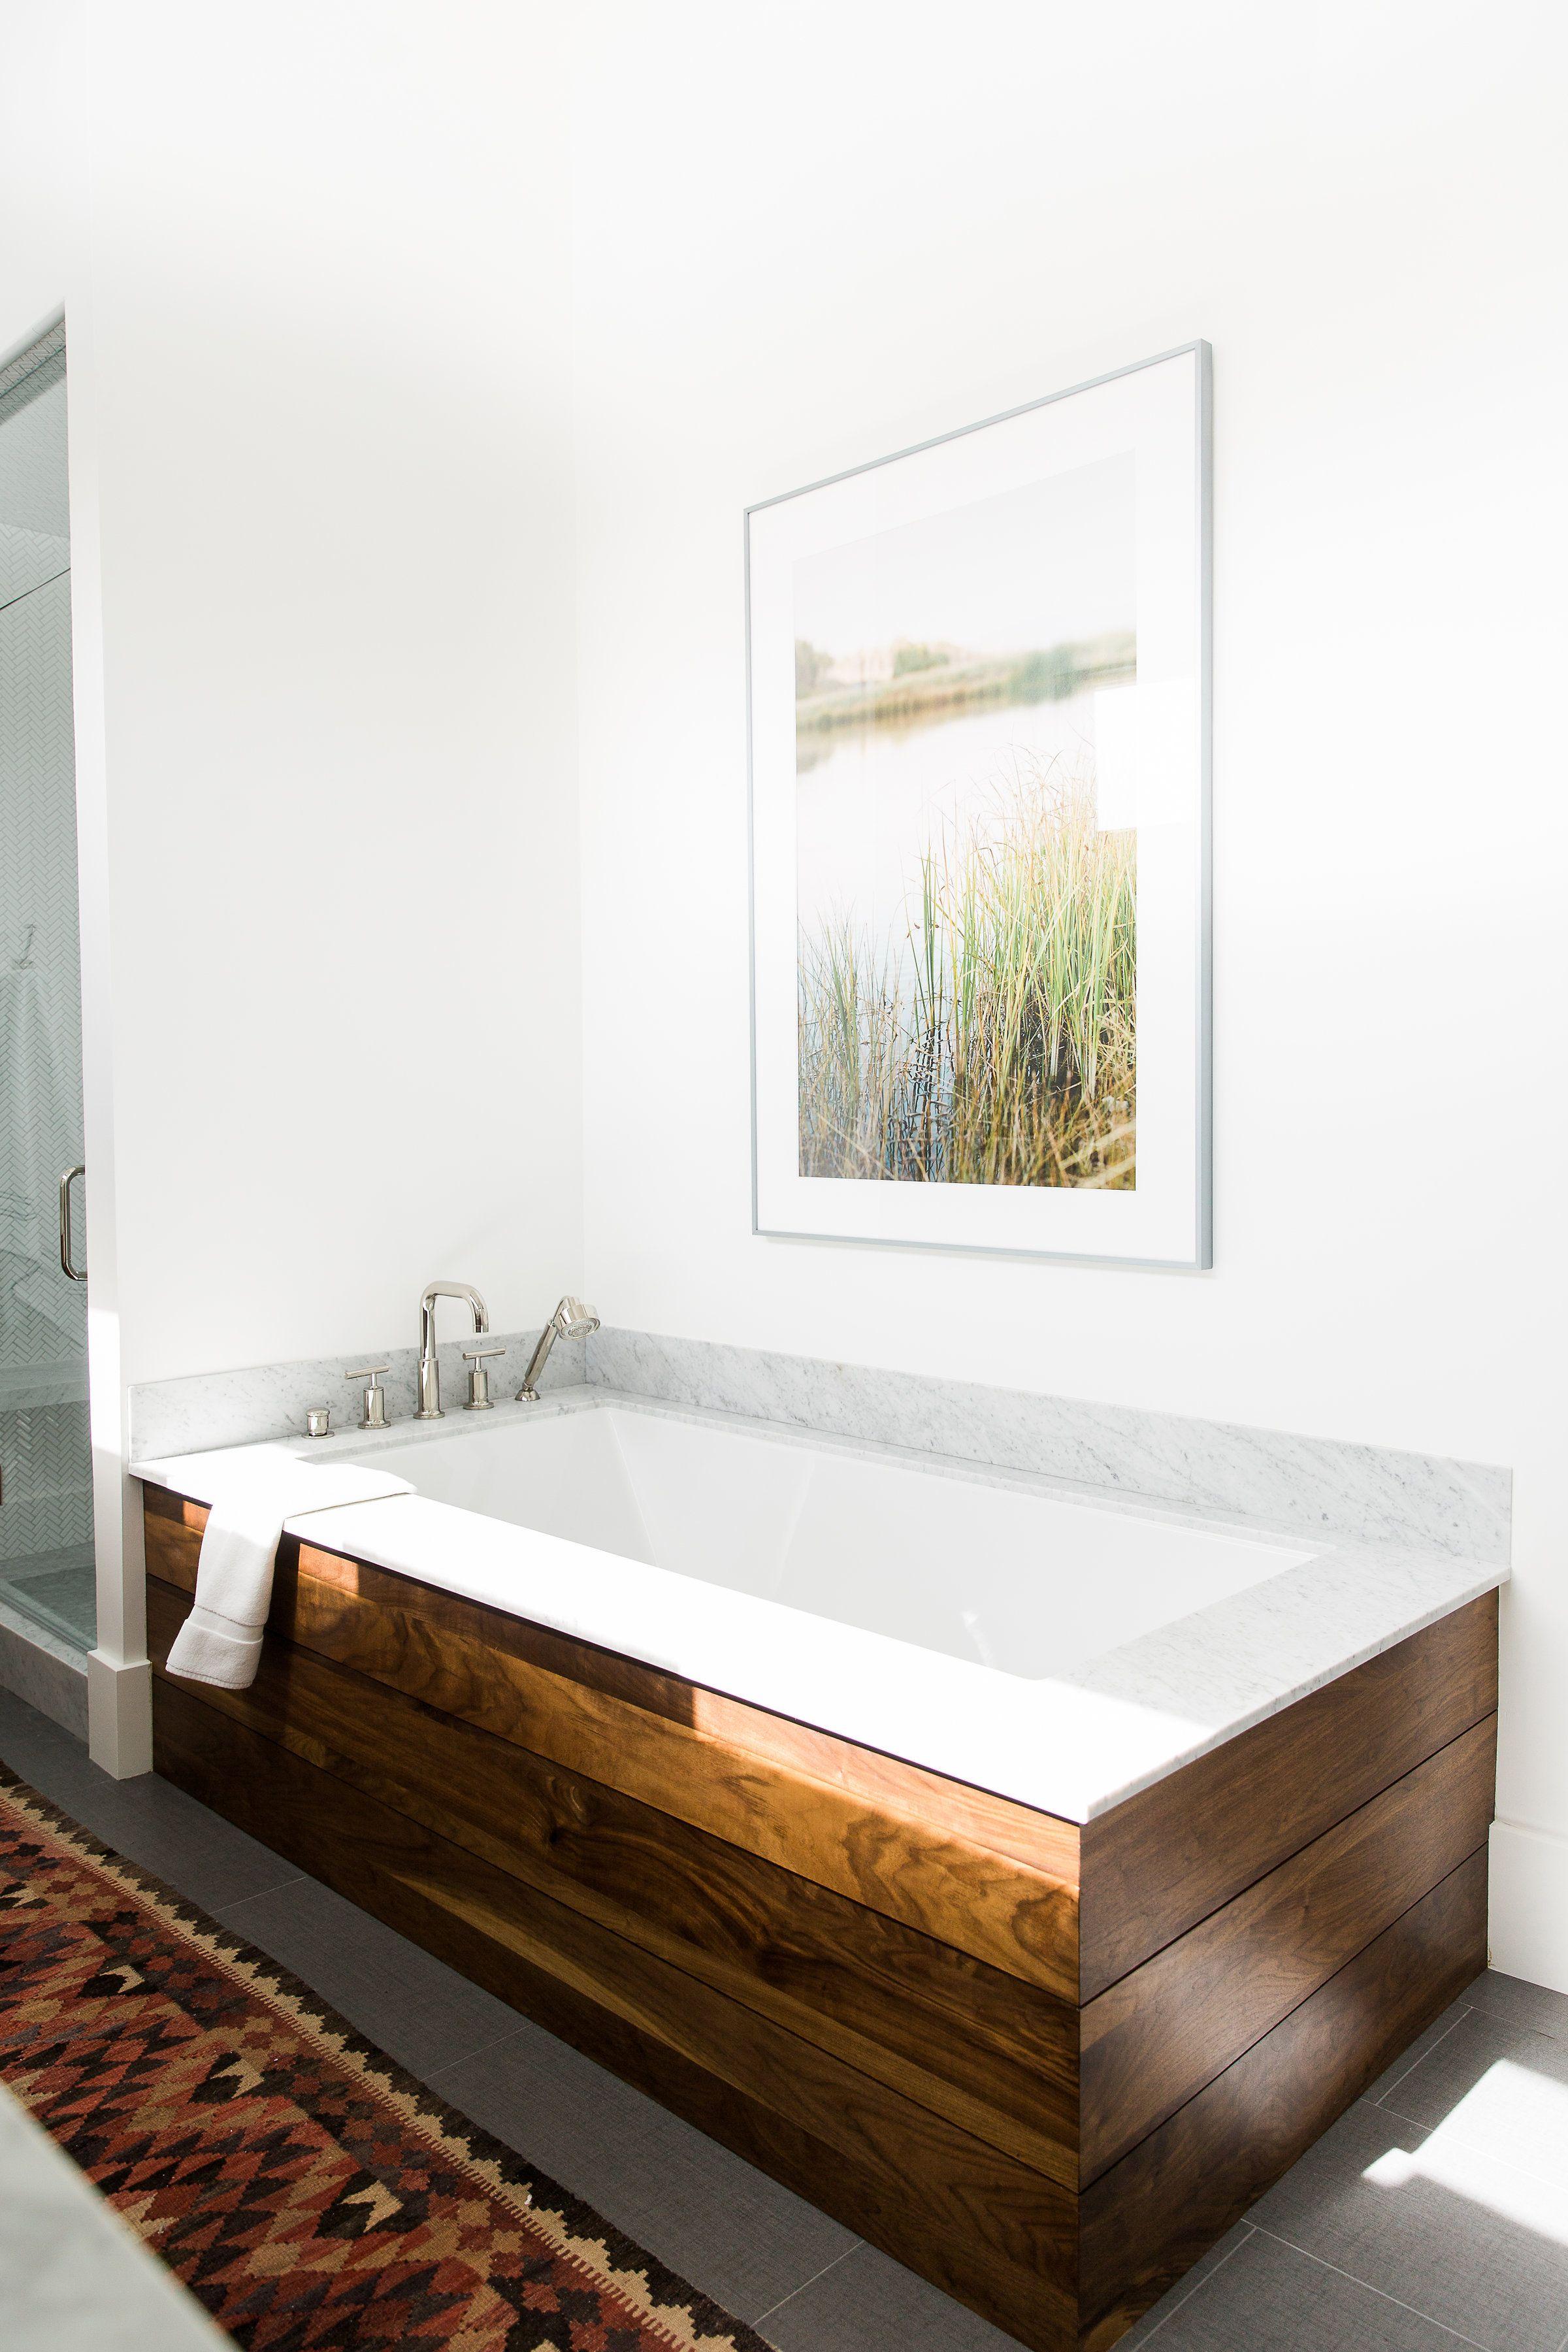 Wood Planking Around Bathtub -- Studio Mcgee